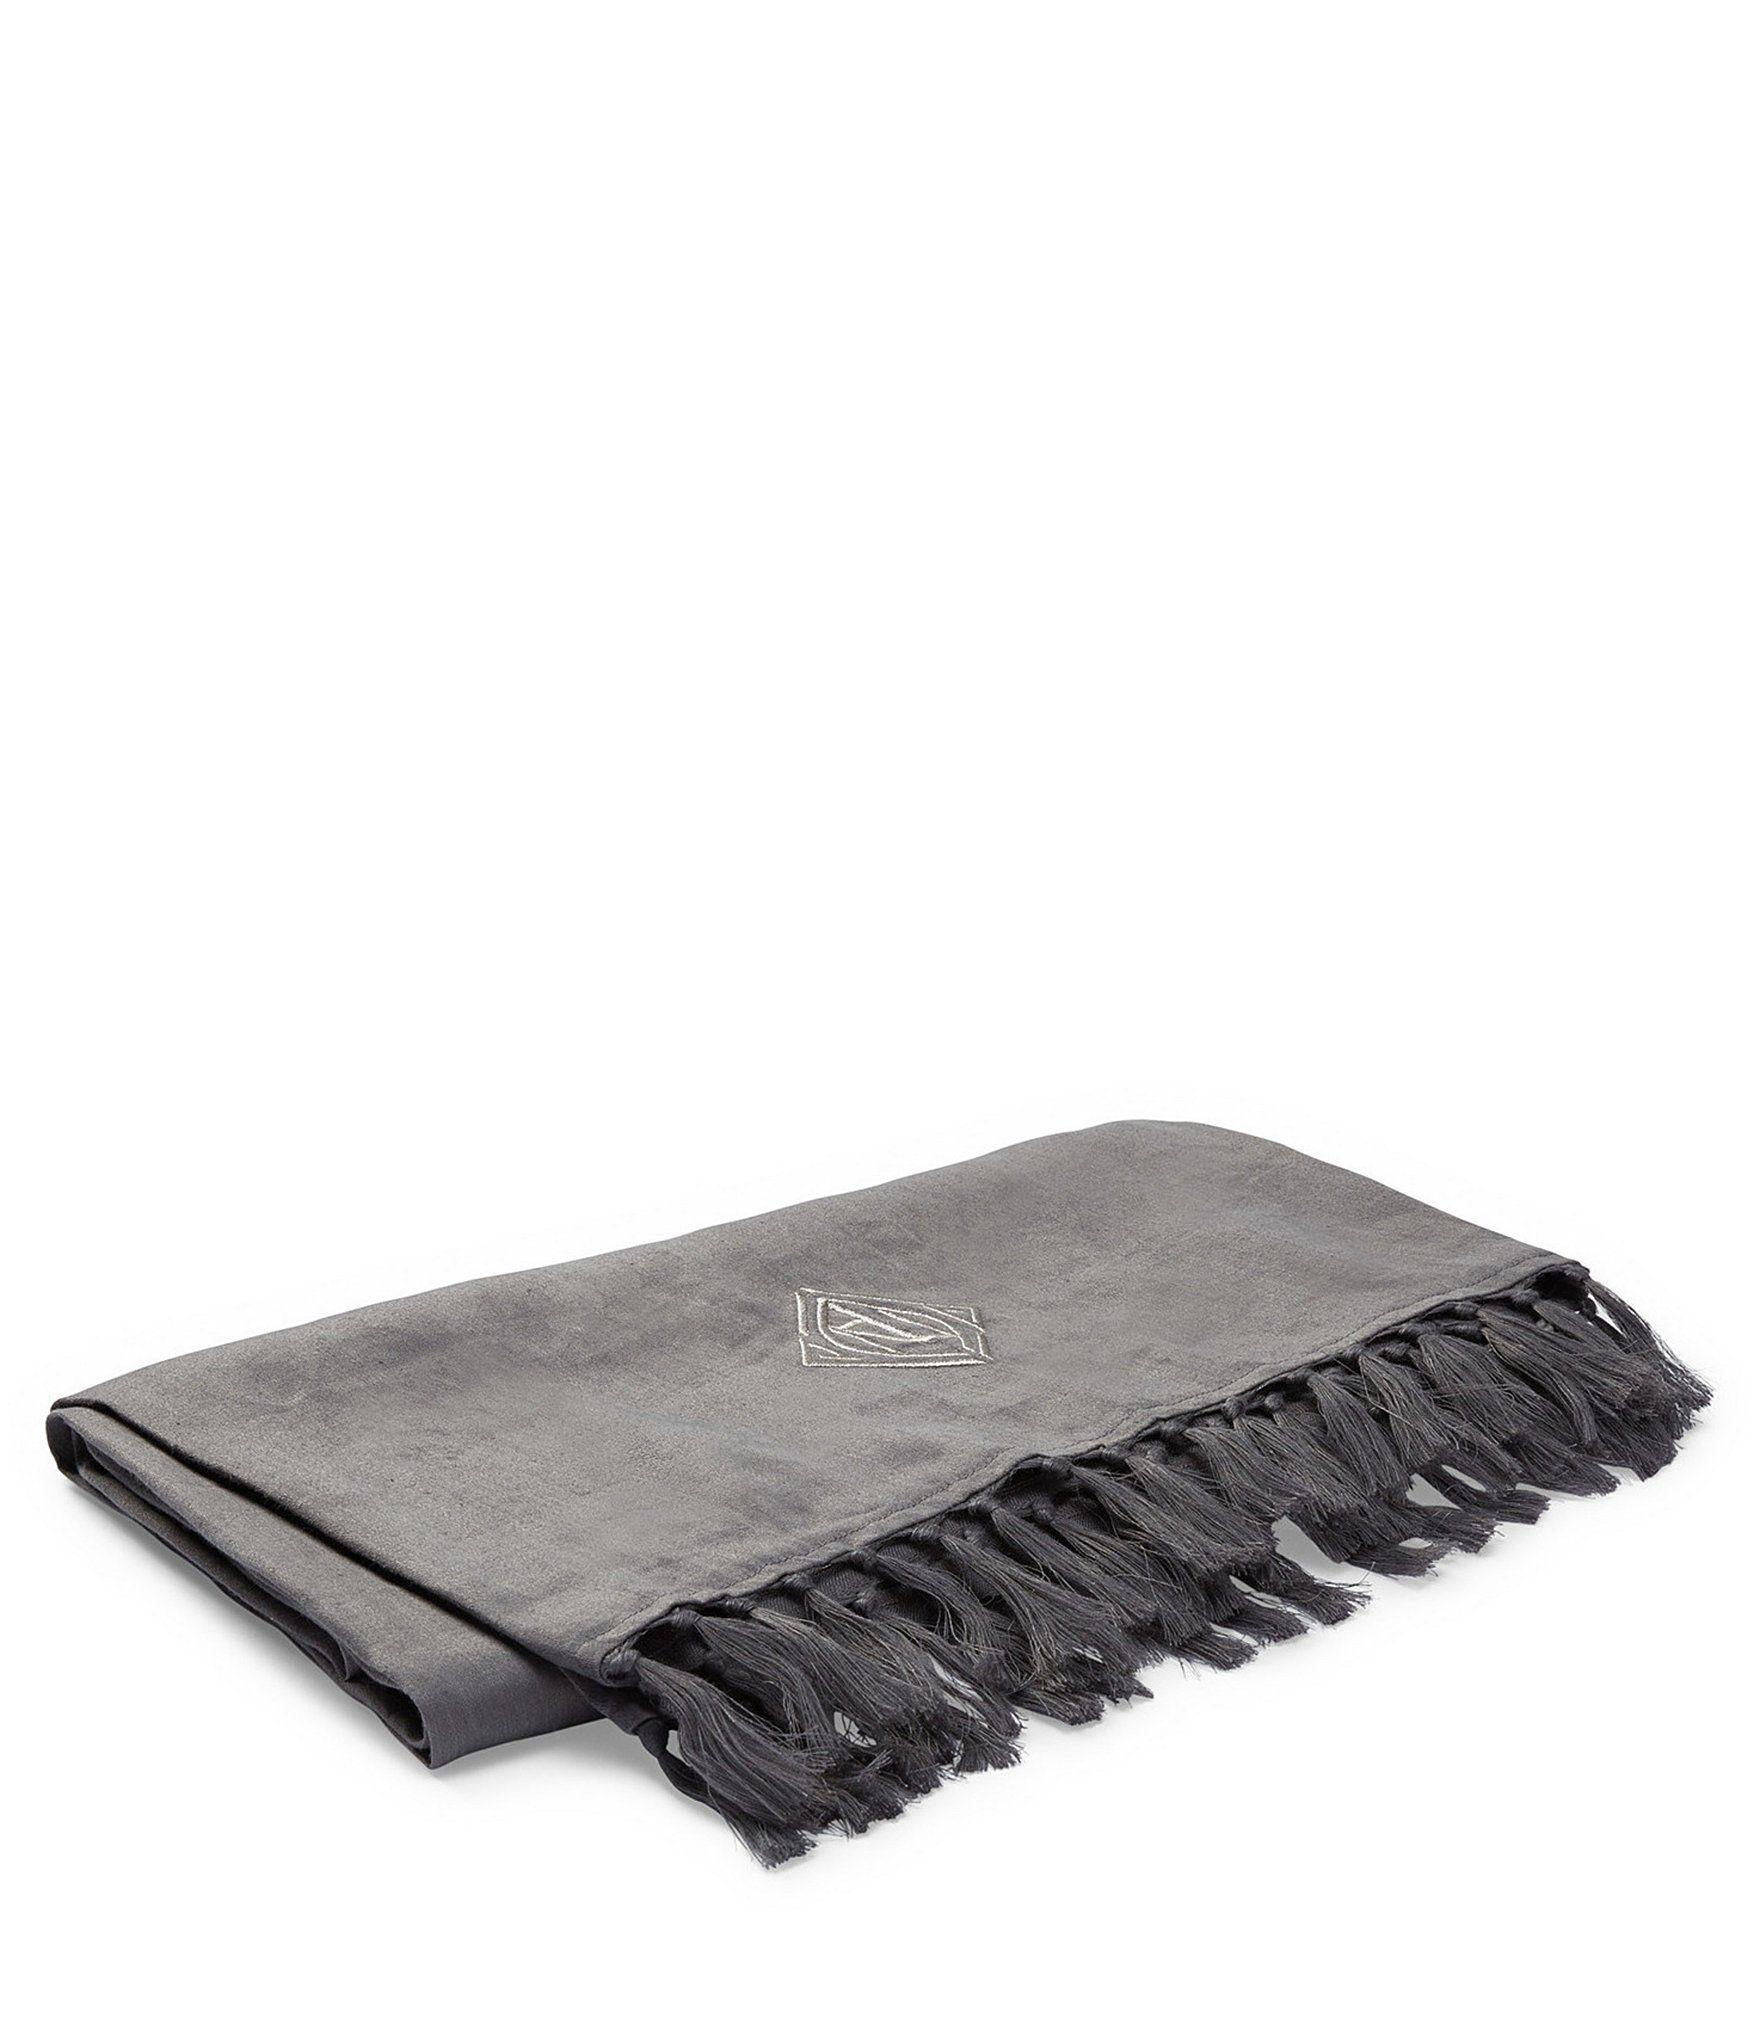 Ralph Lauren Penthouse Grey Collection Aldrich Throw Blanket Charcoal N A Ralph Lauren Collection Art Deco